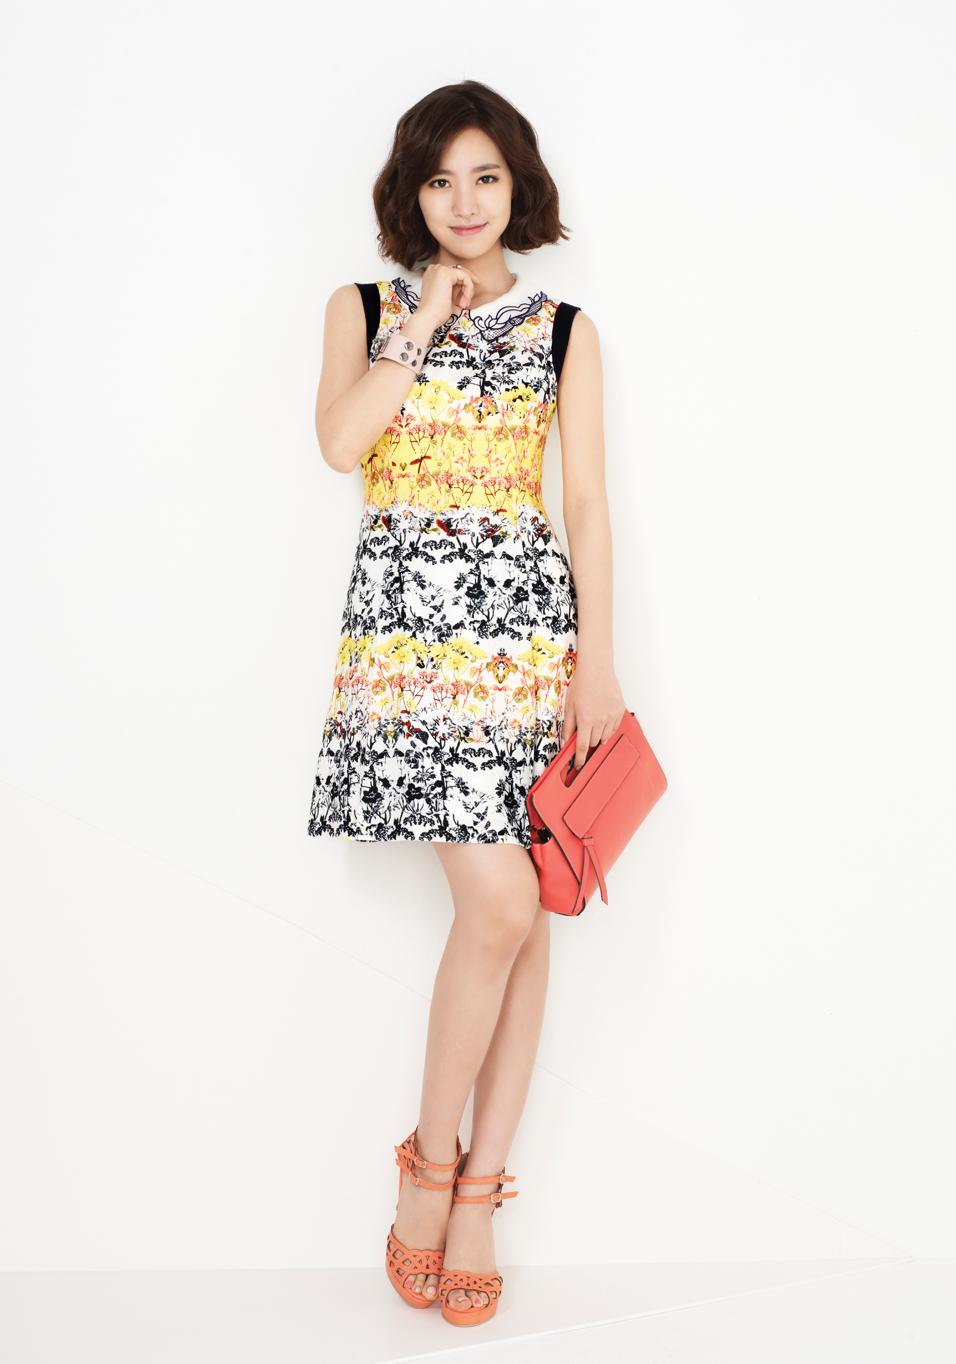 moda coreana nuevos modelos de ropa para chicas en este